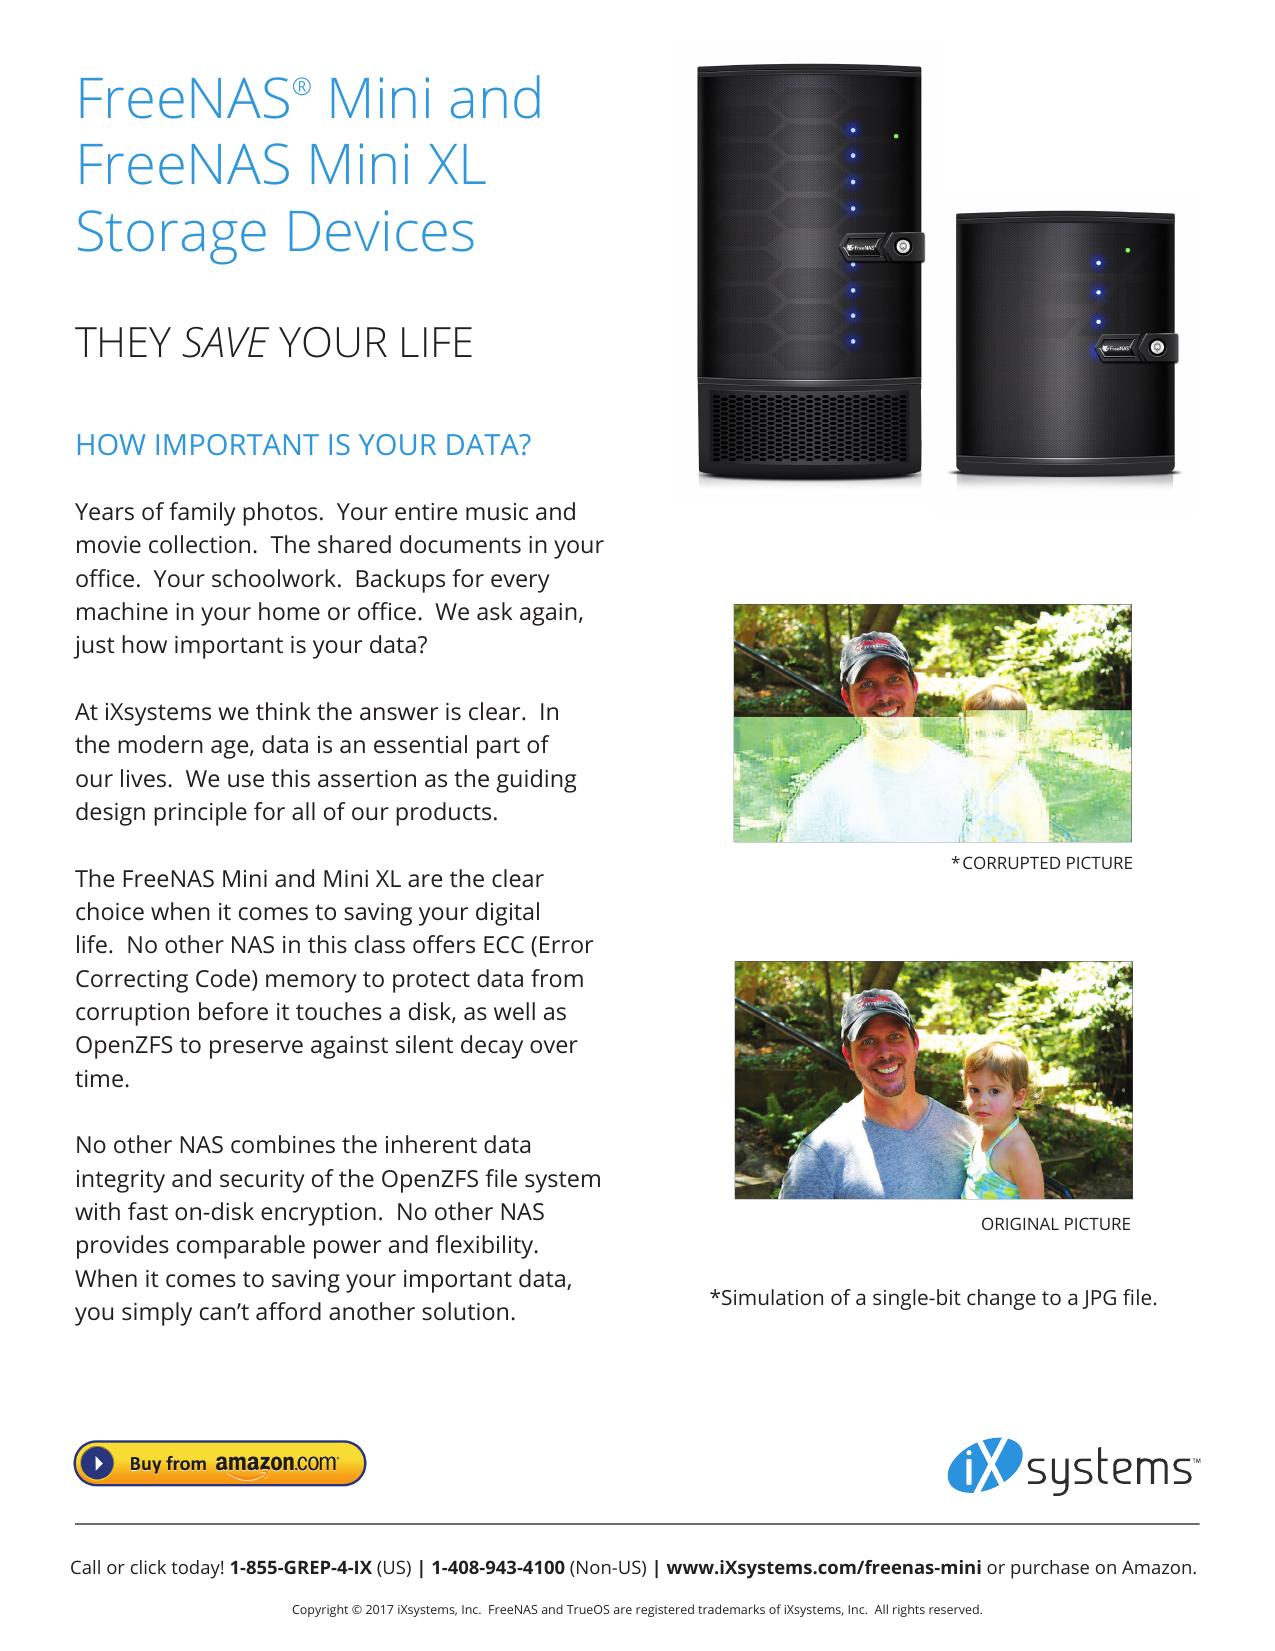 FreeNAS® Mini and FreeNAS Mini XL Storage | manualzz com